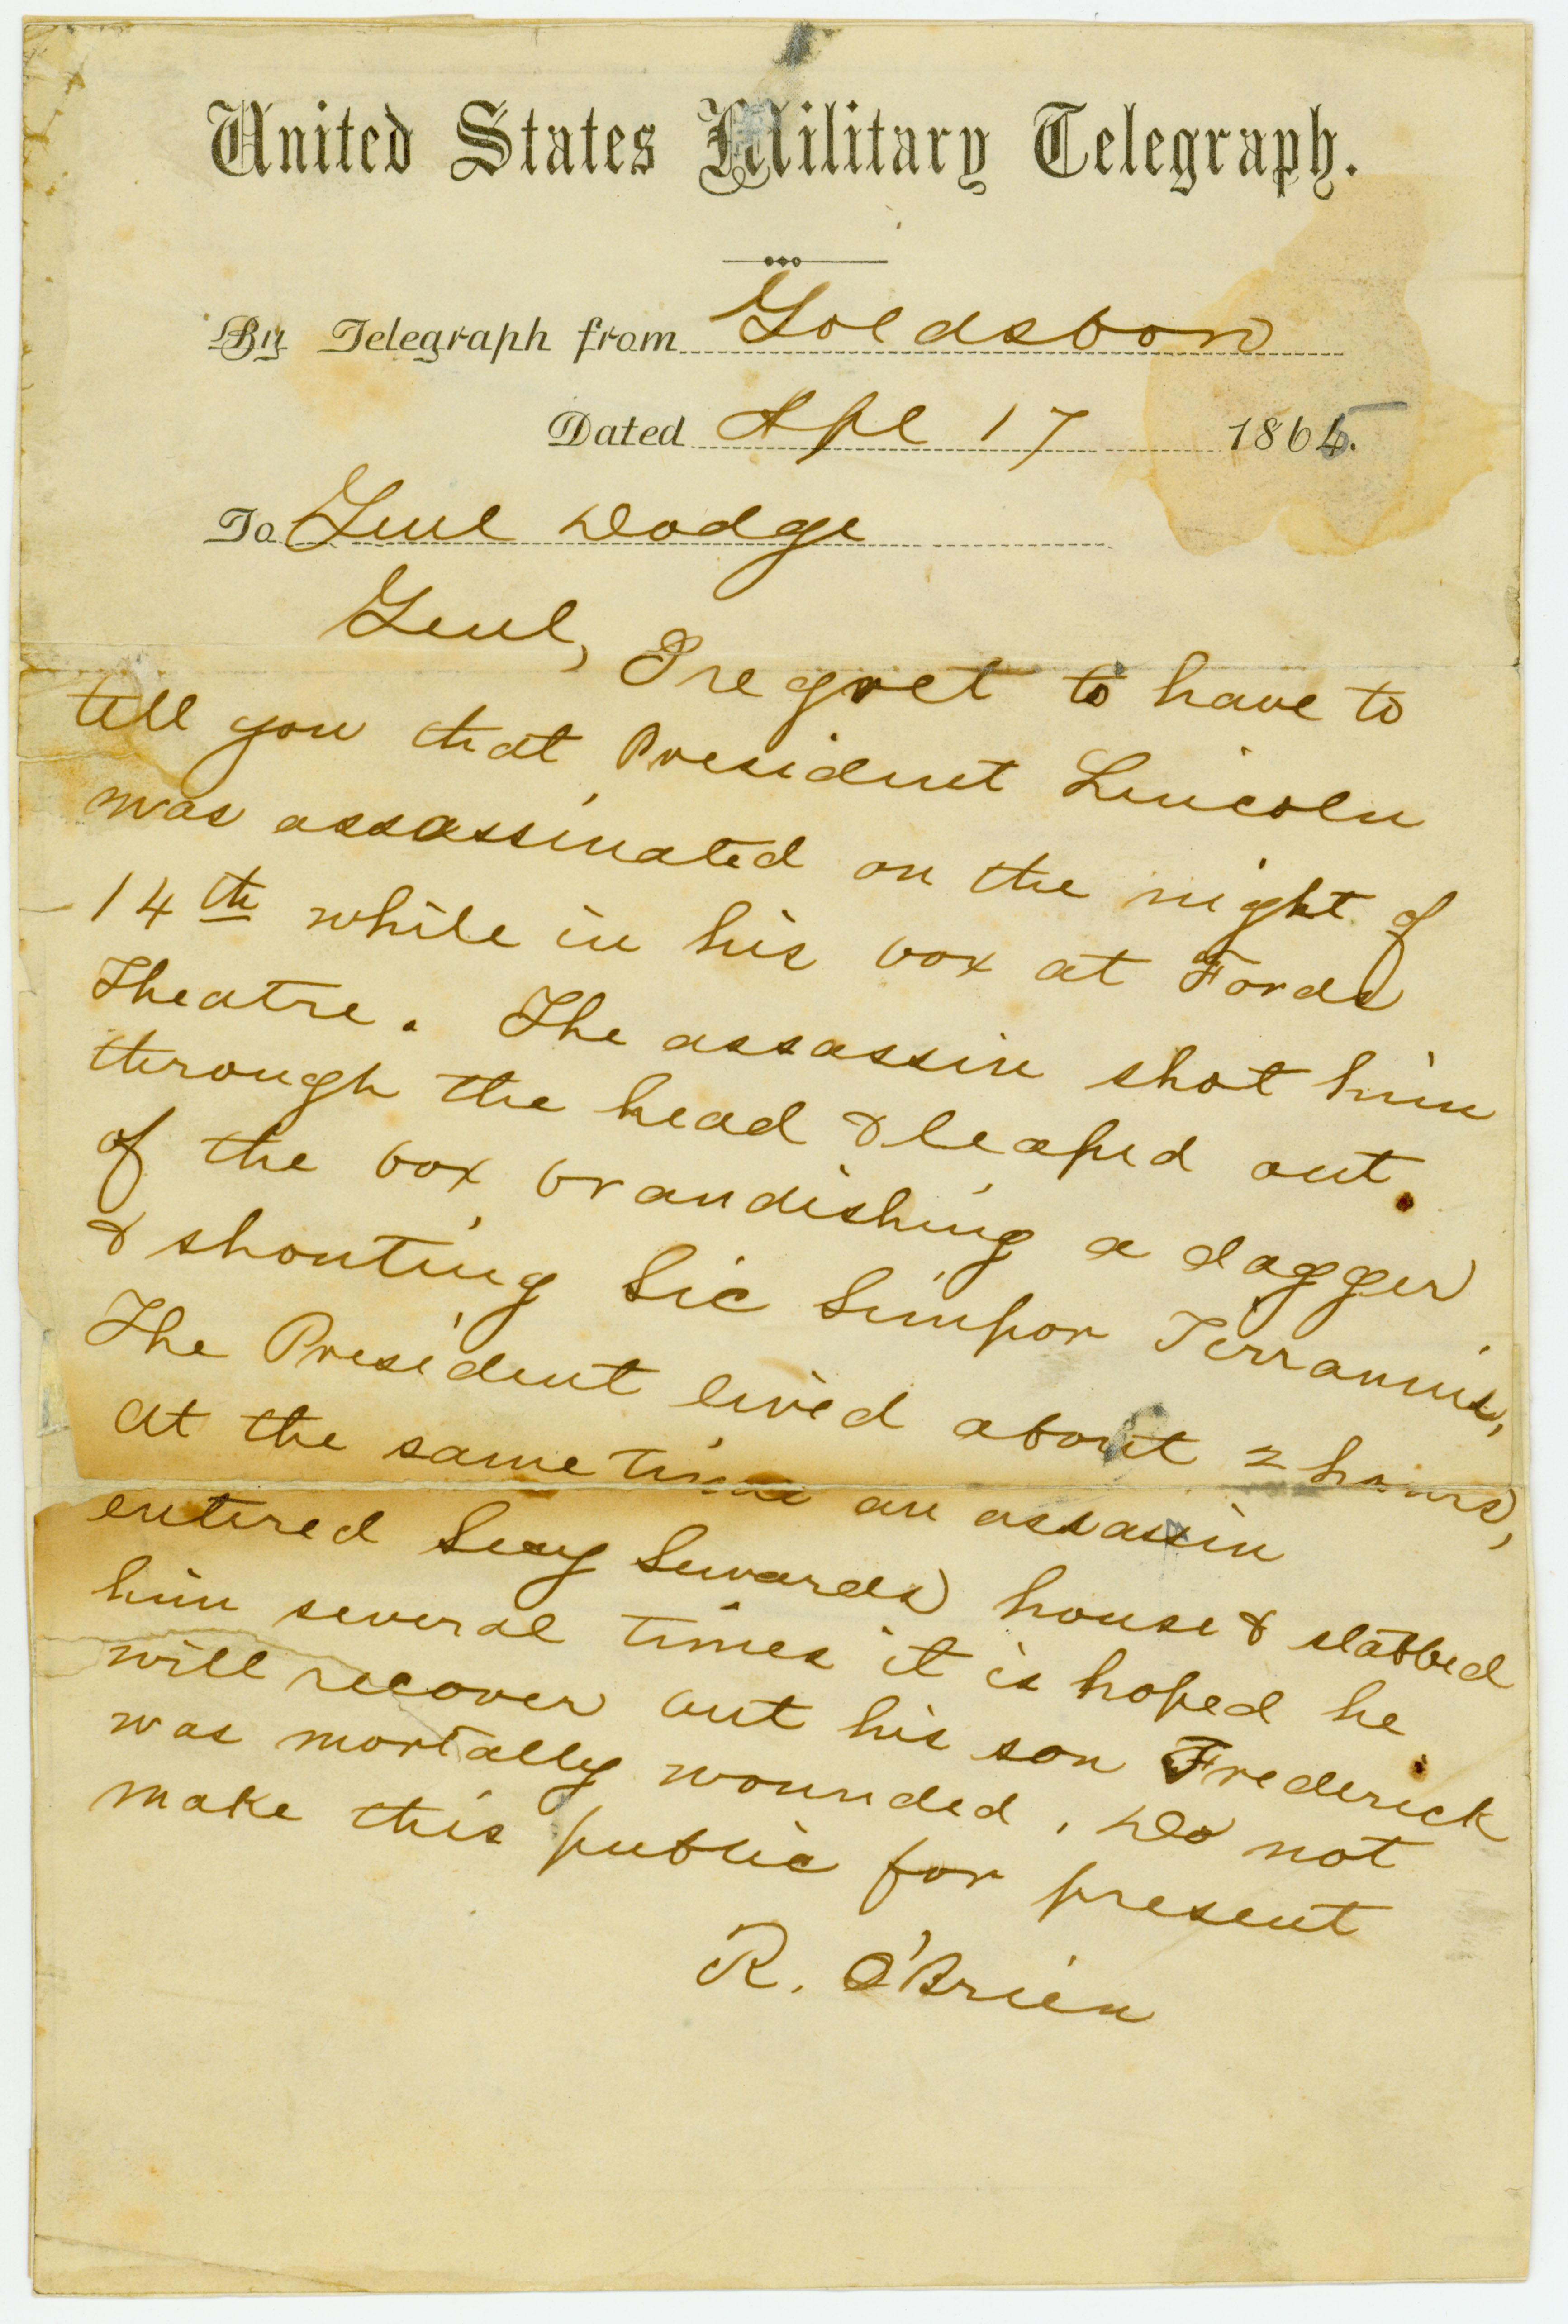 United States Military Telegraph of R. O'Brien, Goldsboro, to Genl. Dodge, April 17, 1865